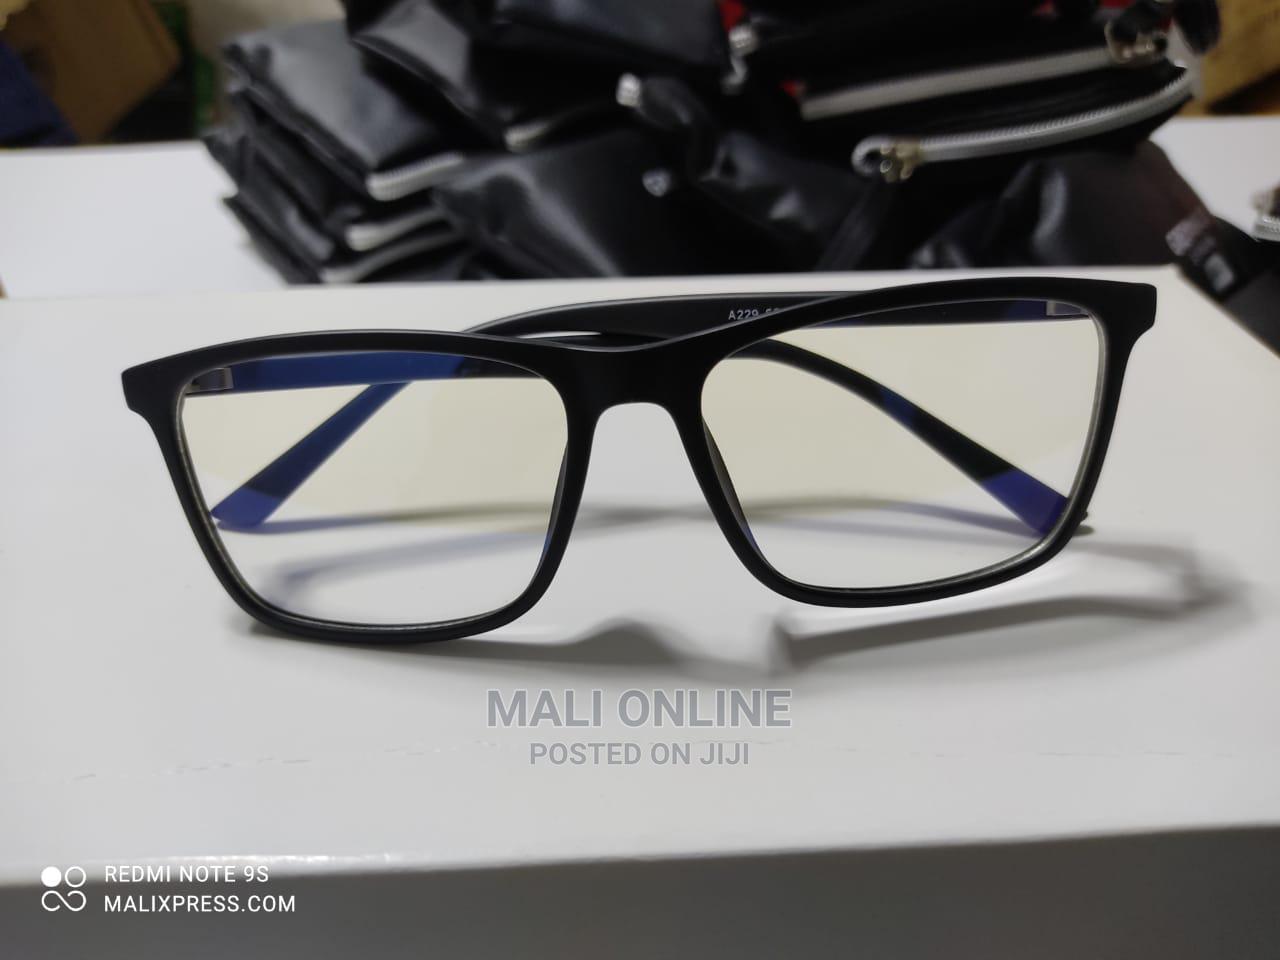 Antiblue Light Computer Antiglare Glasses